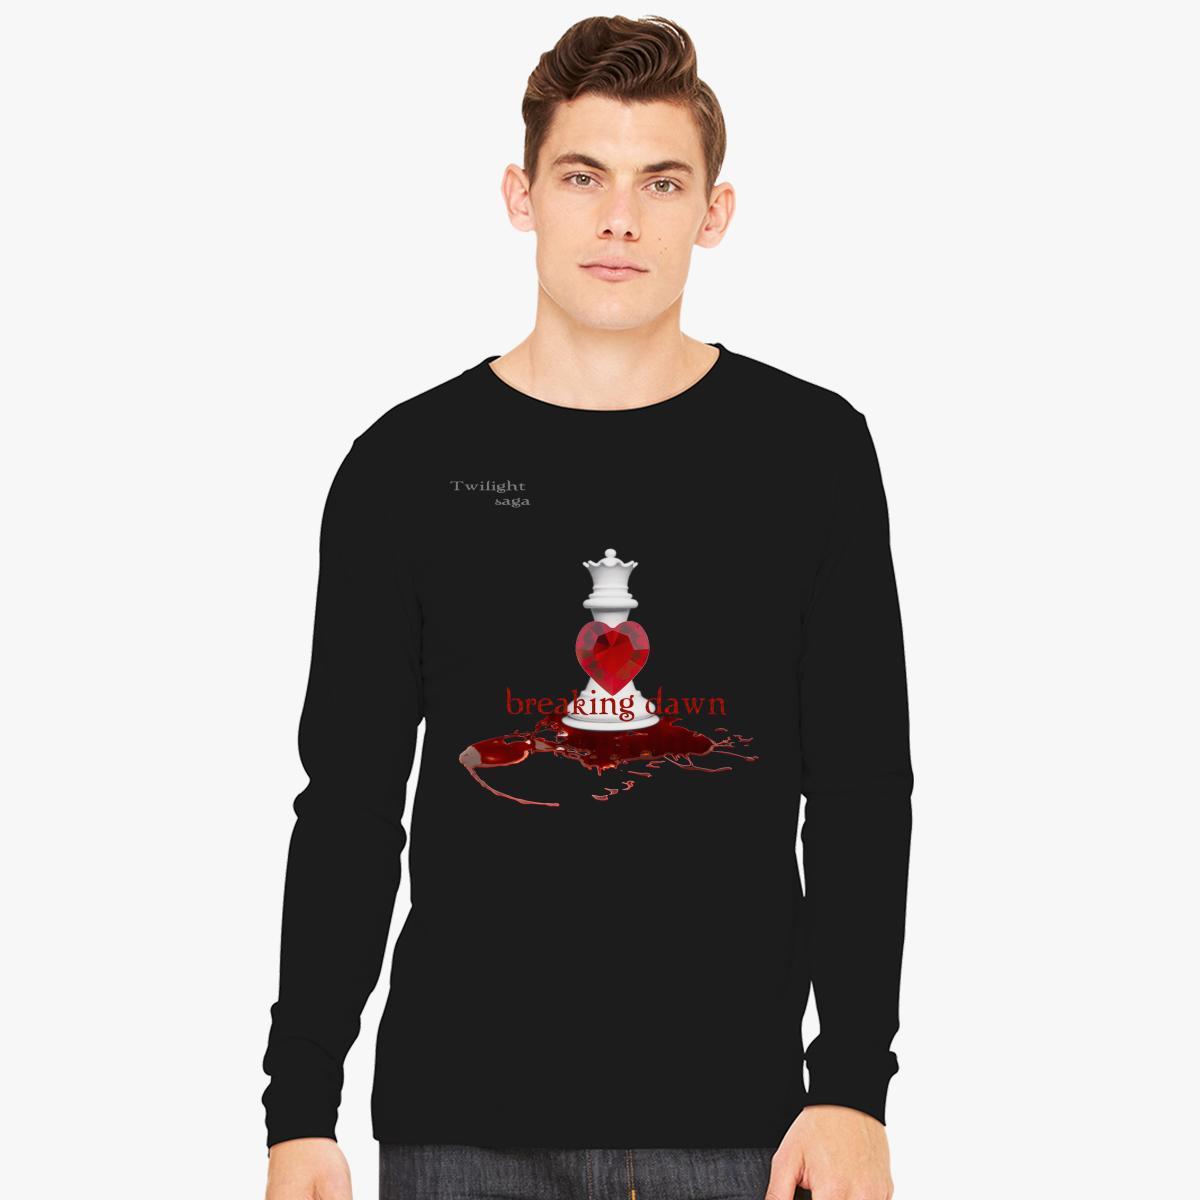 Film Twilight Manica Lunga T-shirt I0vfh9hD8B